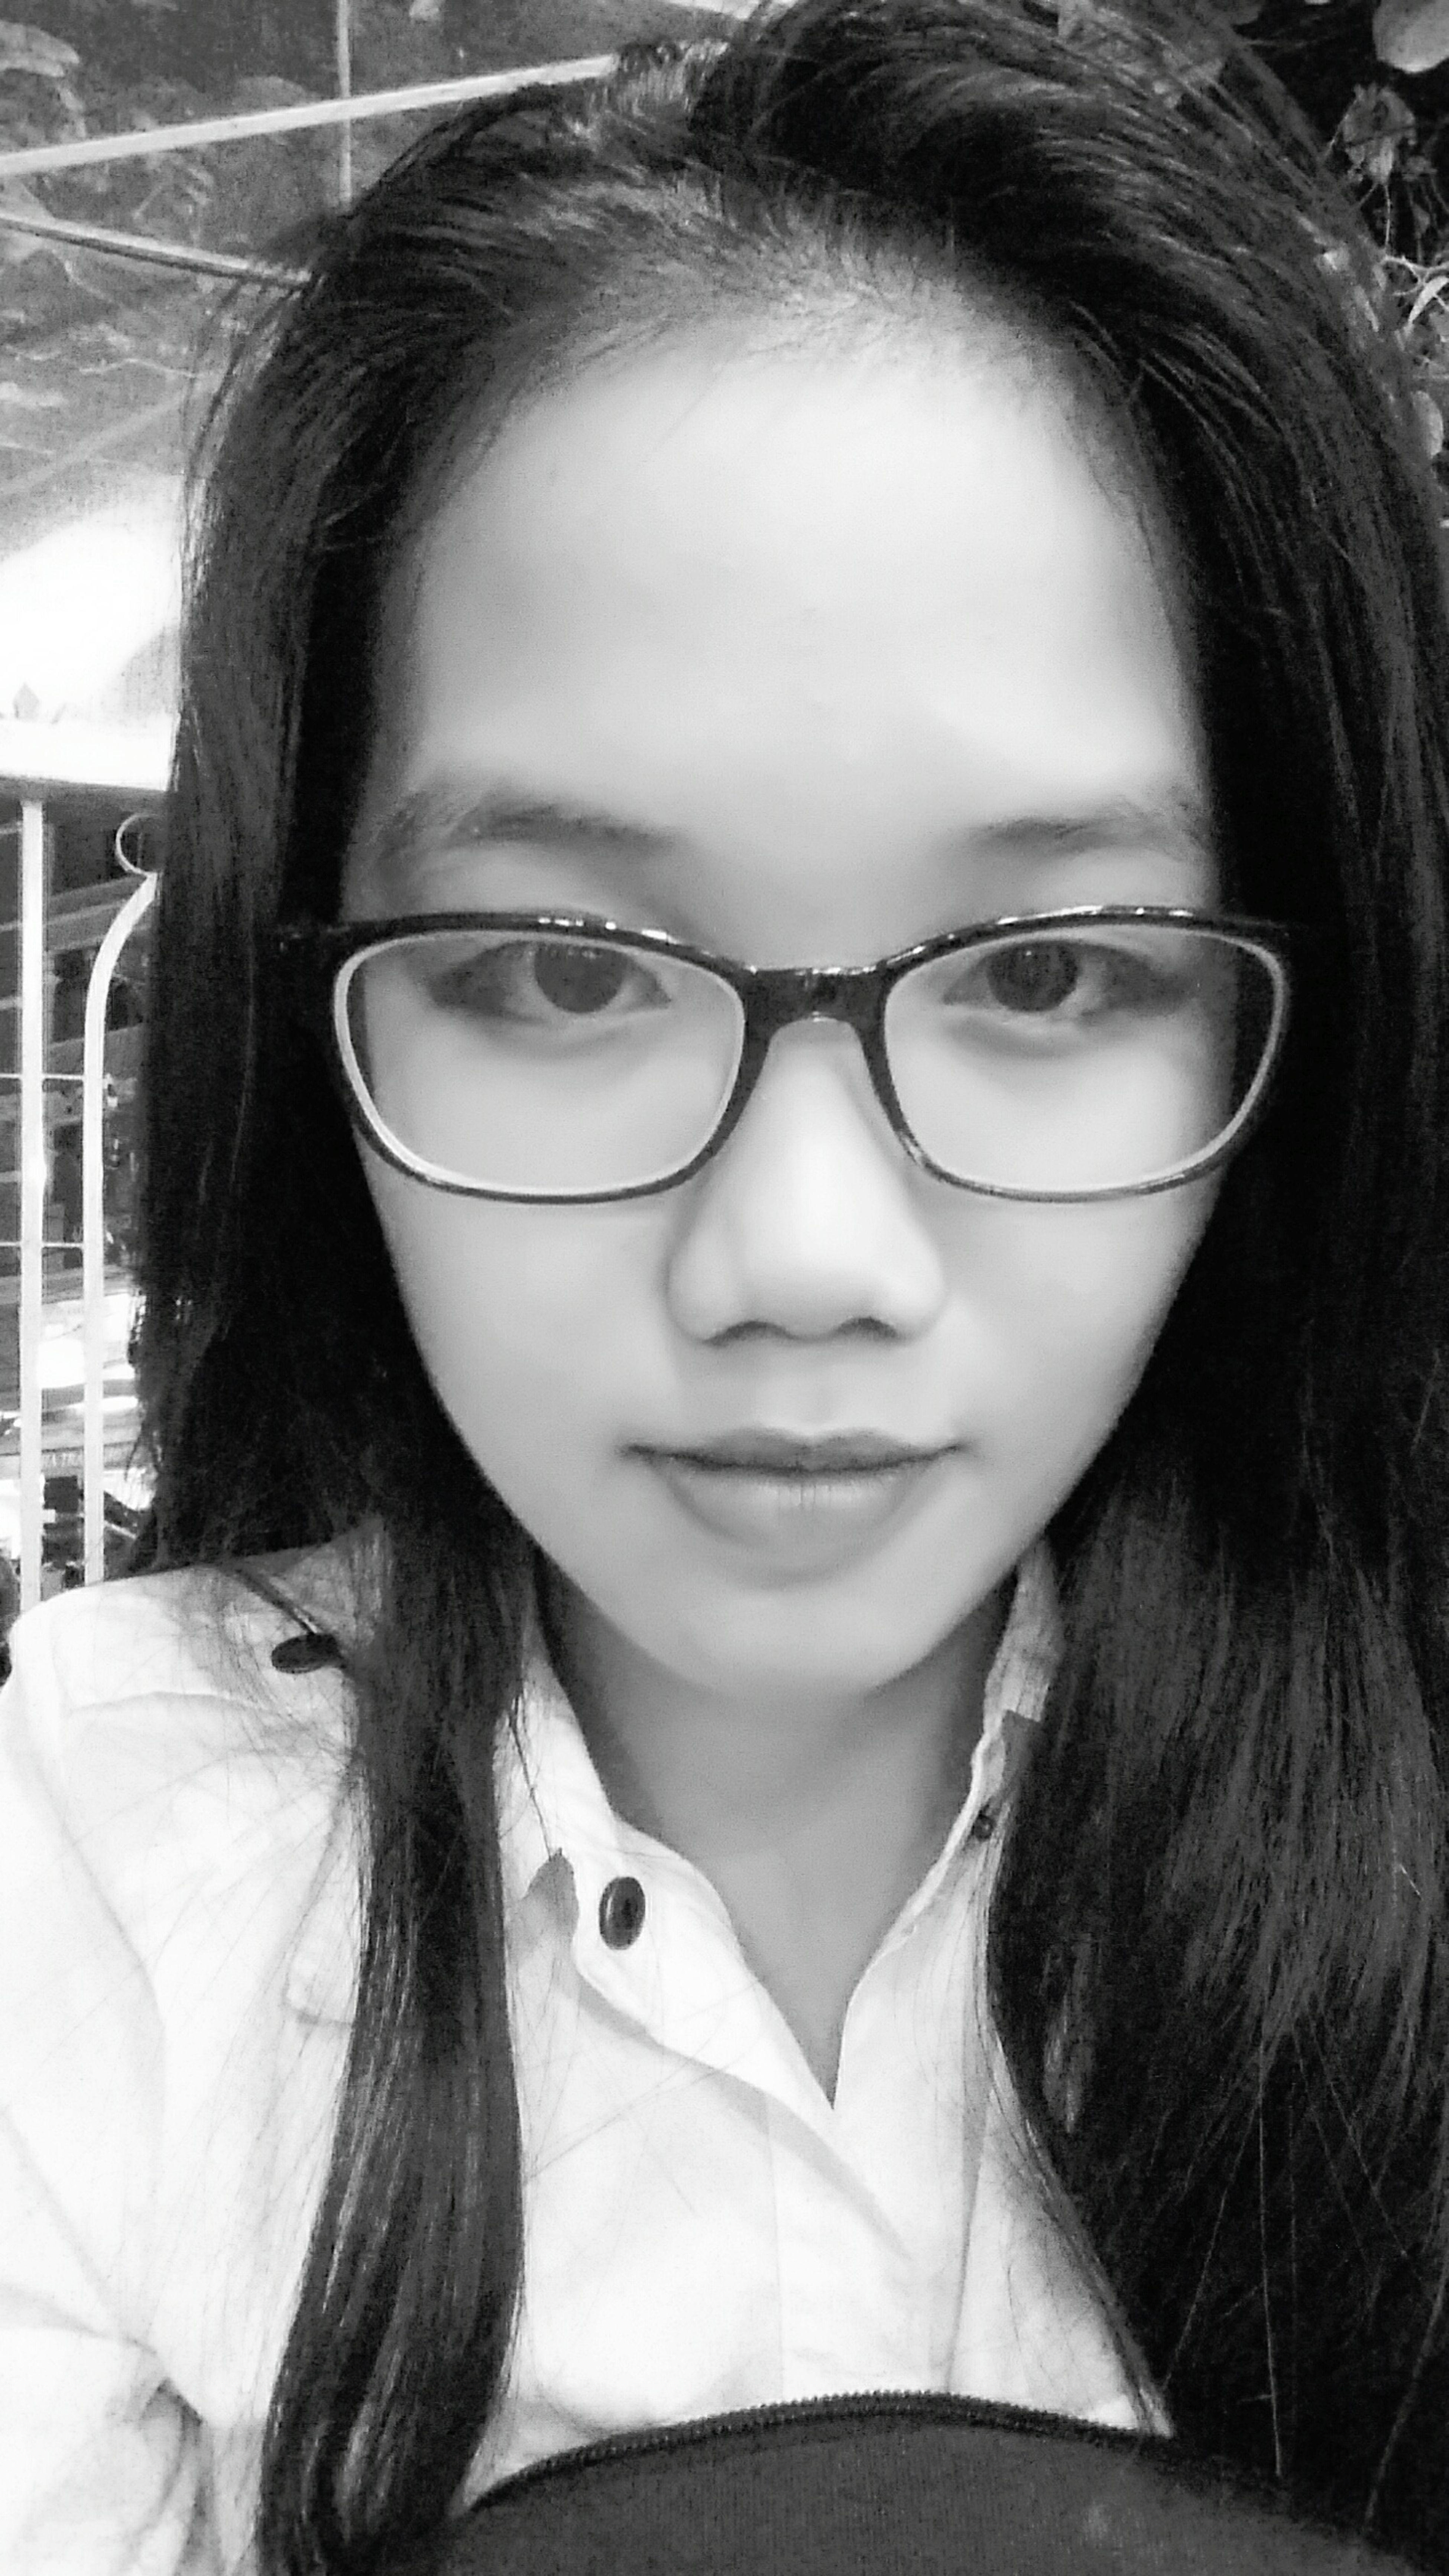 Selfie ✌ Uyenphuong 150214 Valentinesday Alone... First Eyeem Photo